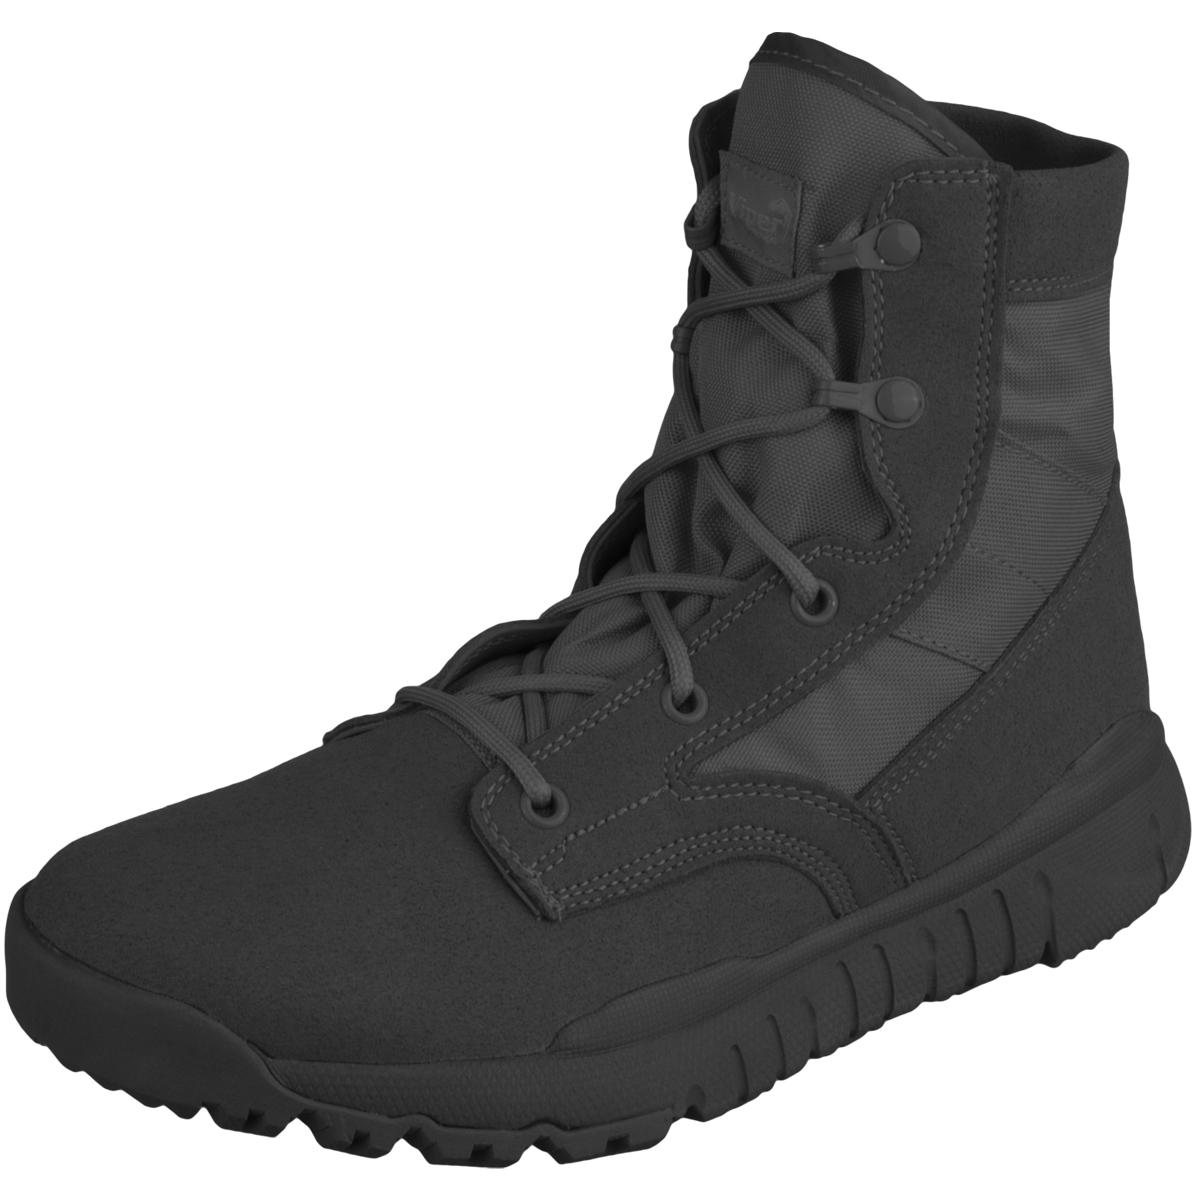 Viper Tactical Sneaker Hiking Outdoor Footwear Security ...